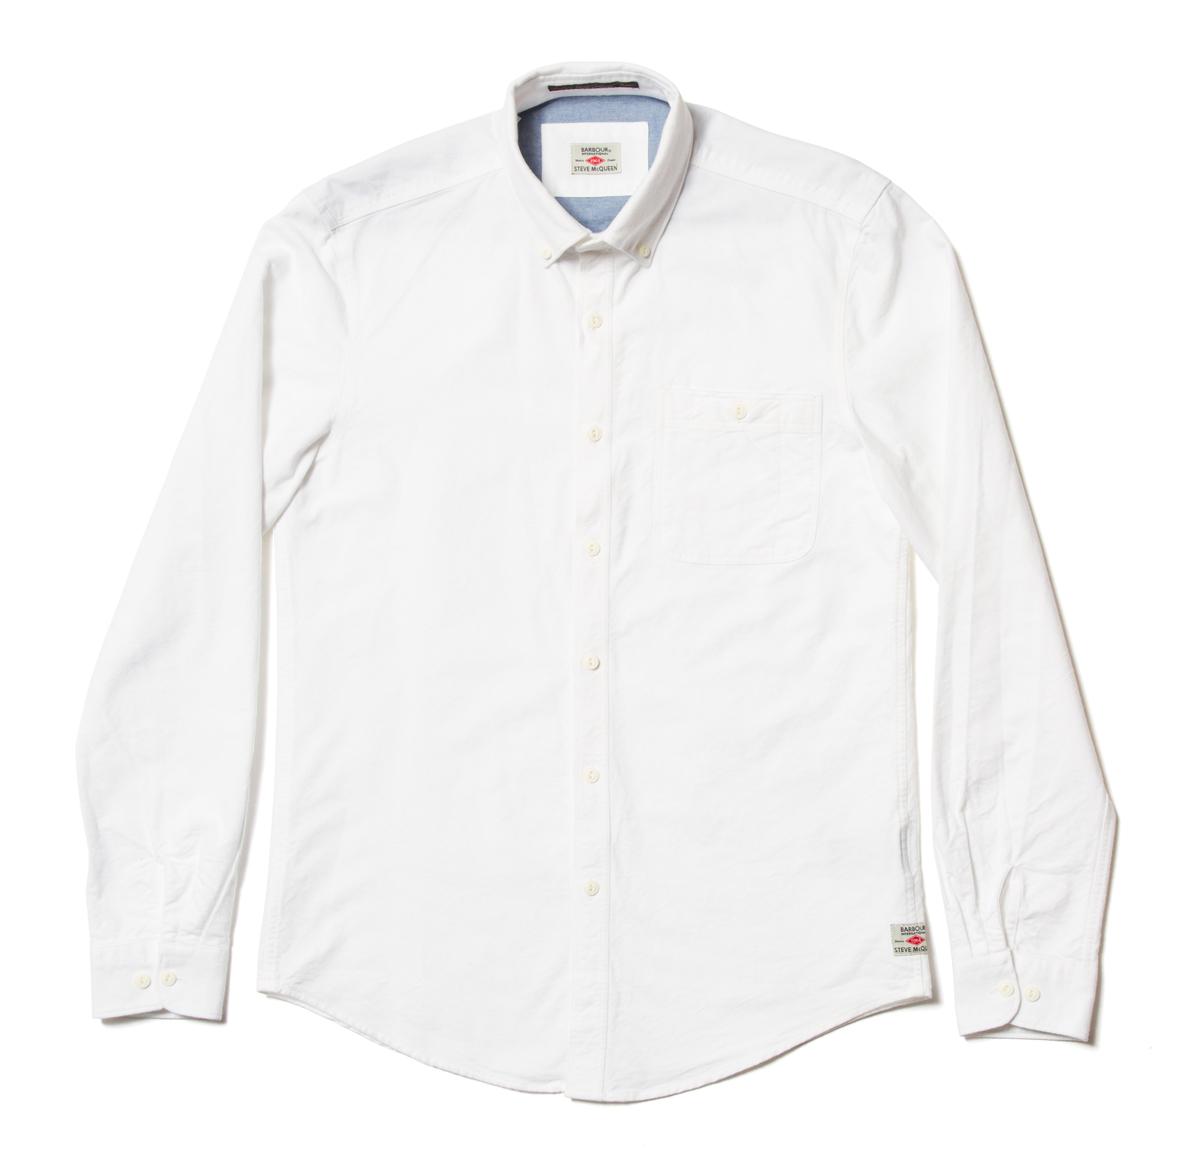 Barbour Steve McQueen Clay Shirt £85